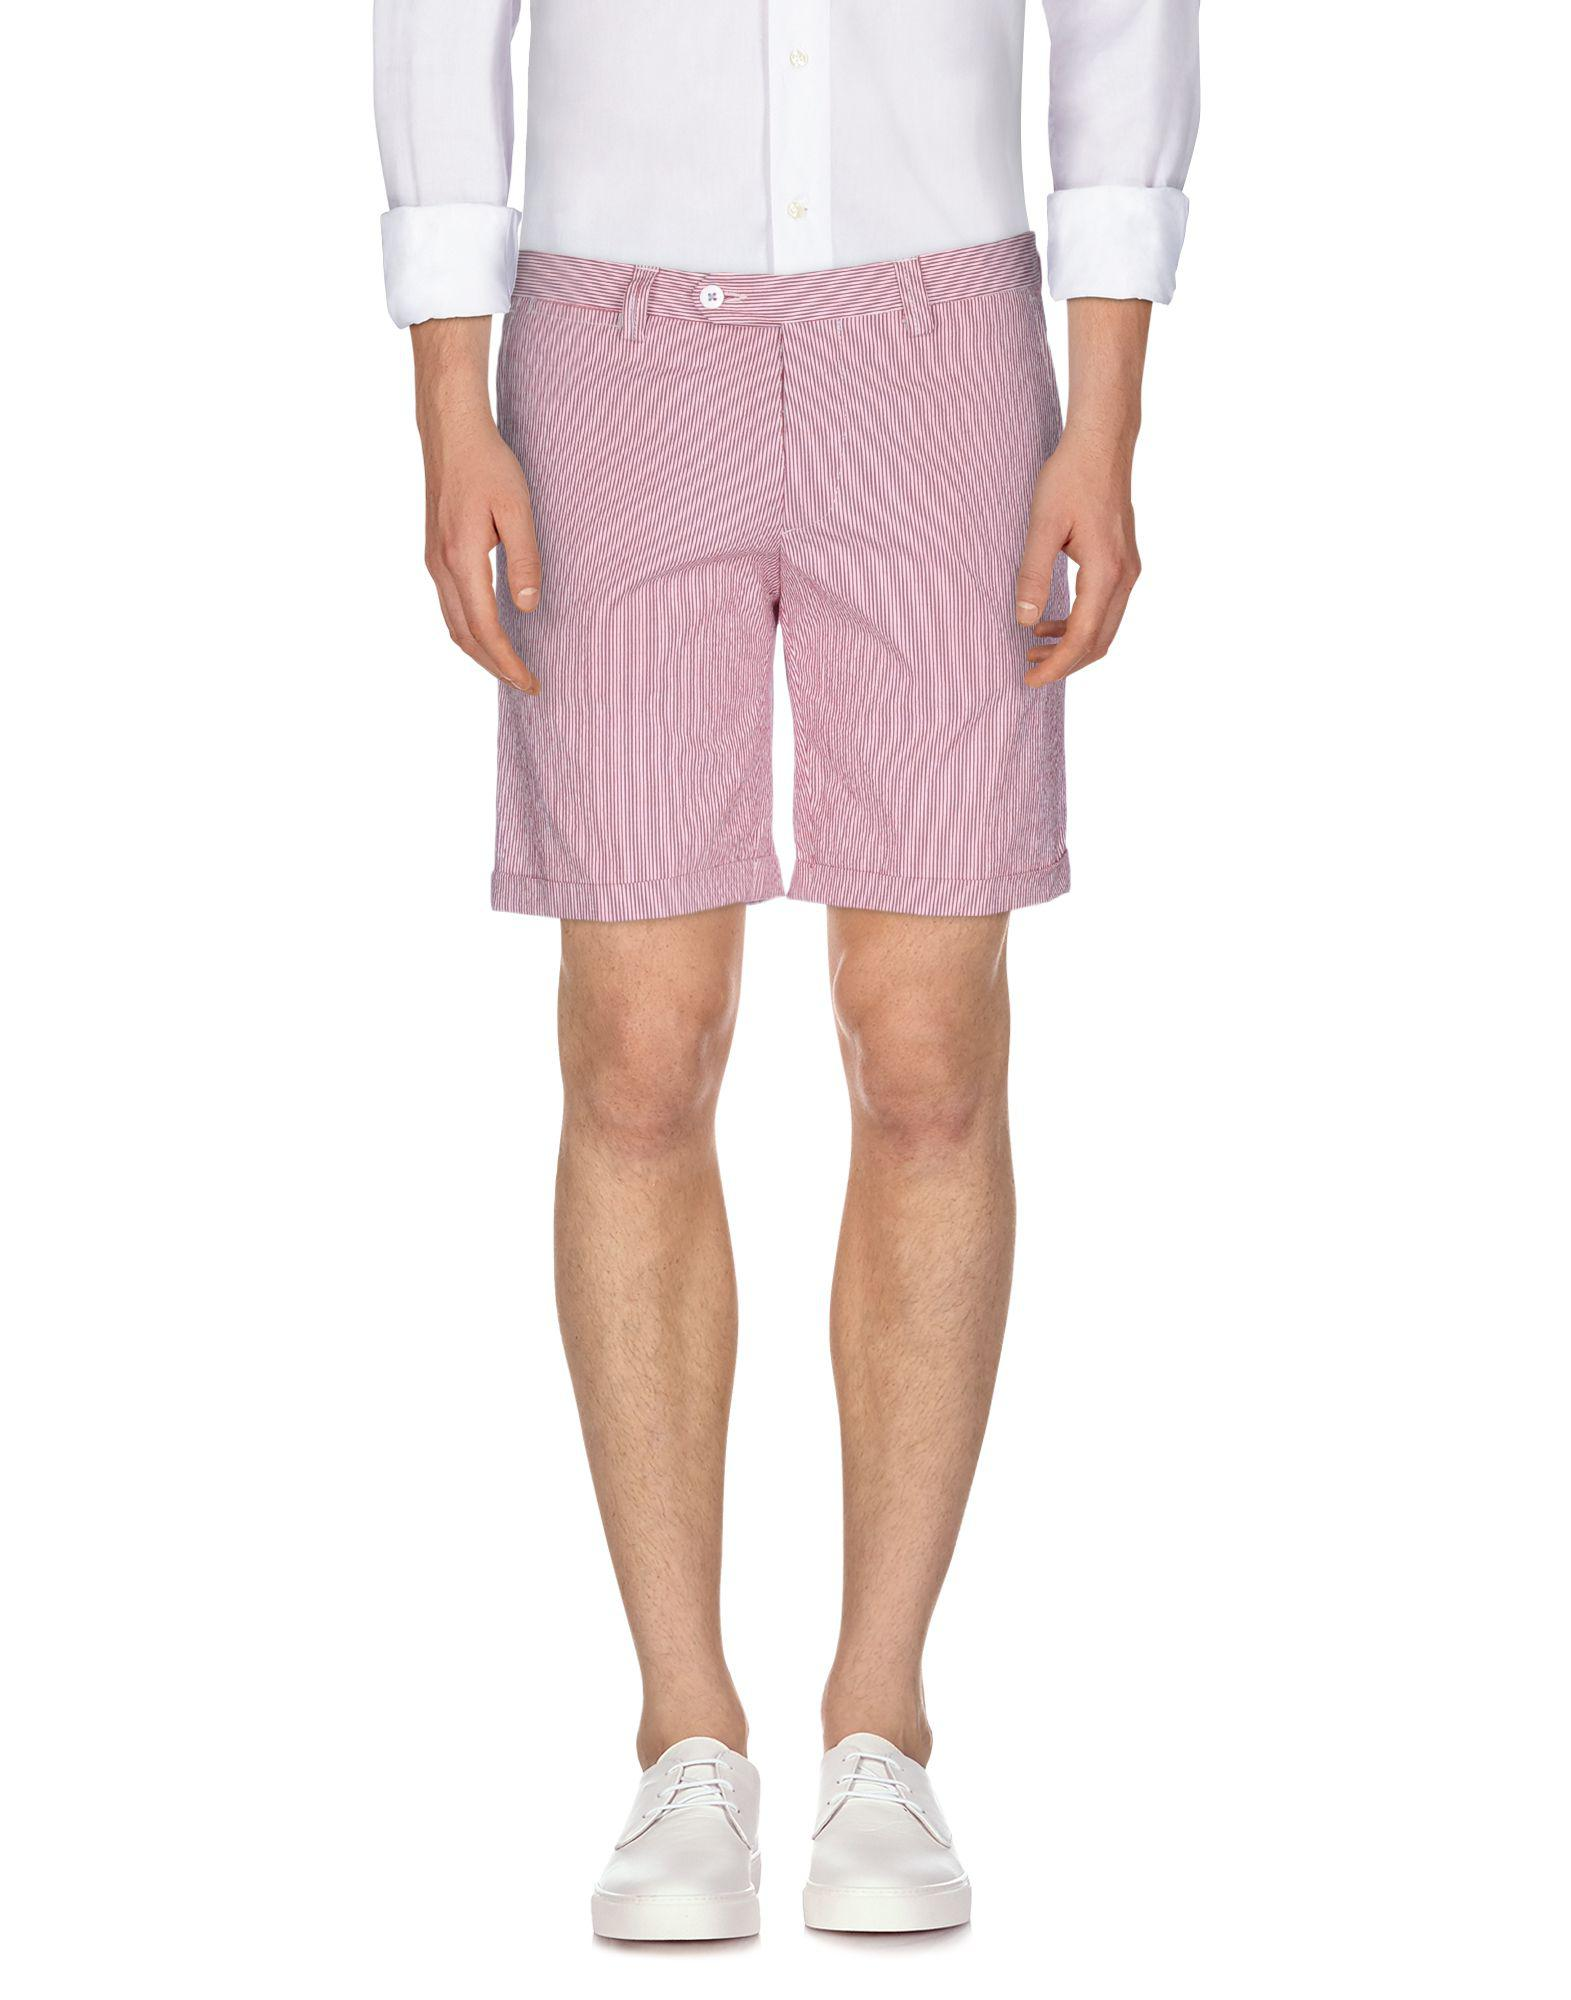 TROUSERS - Bermuda shorts Roberto Pepe hO1JxV